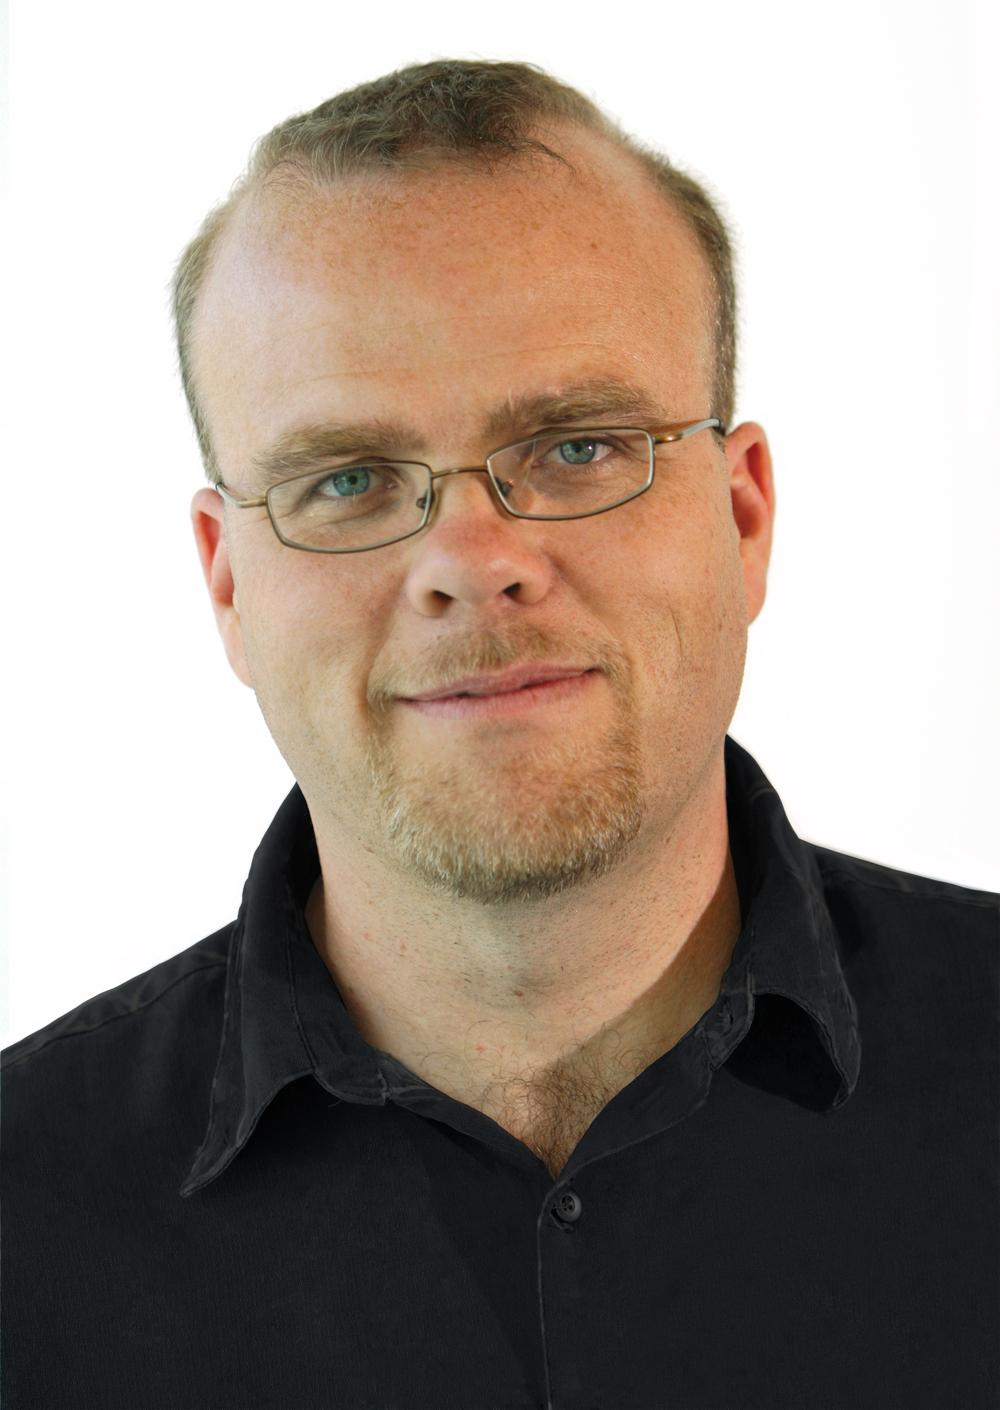 Rasmus Lerdorf - Bio